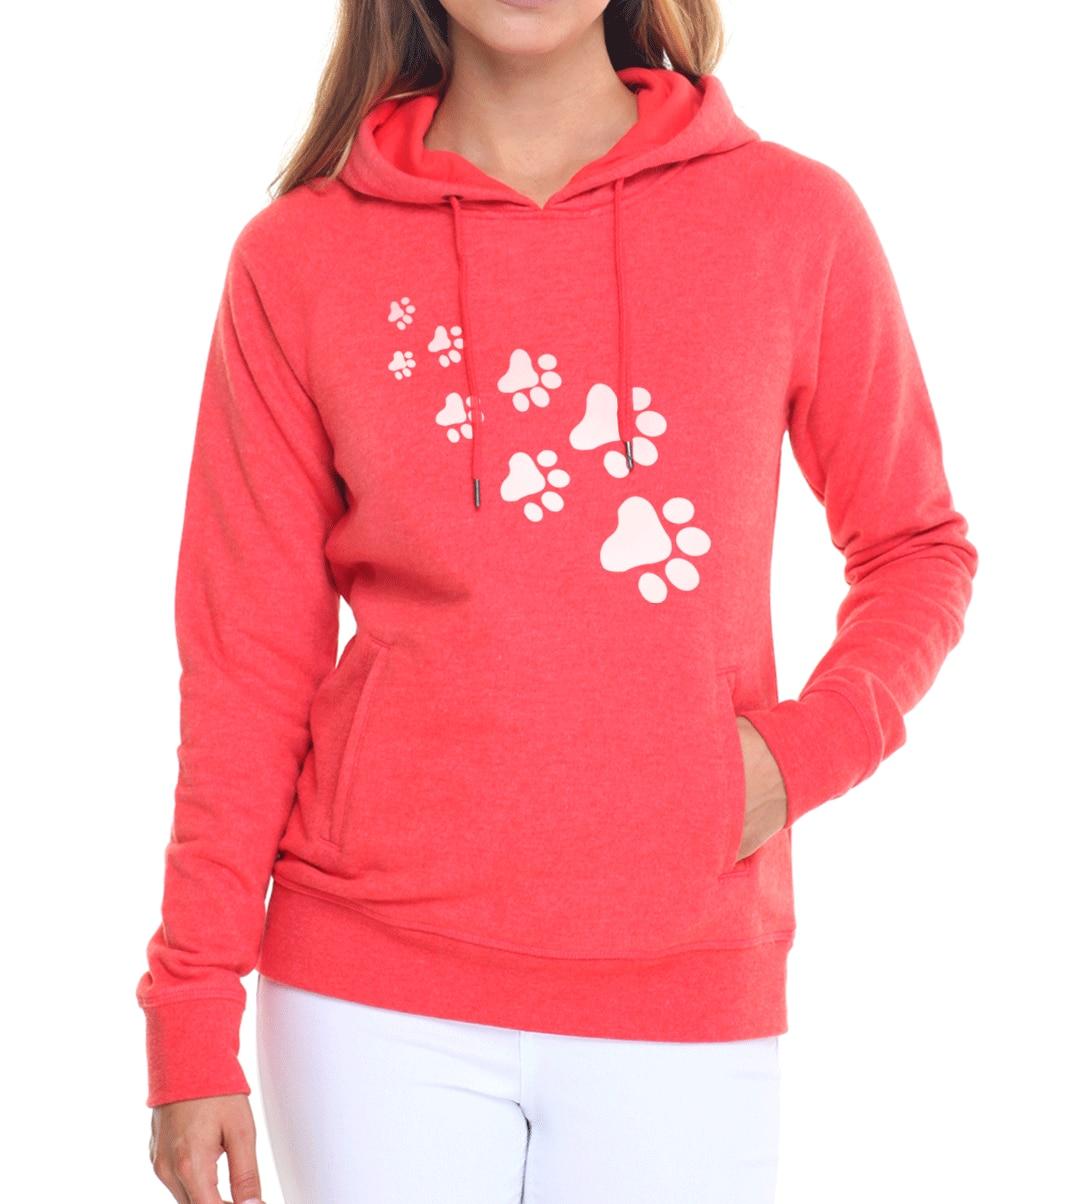 Casual fleece autumn winter sweatshirt pullovers 17 kawaii cat paws print hoodies for Women black pink brand tracksuits femme 10